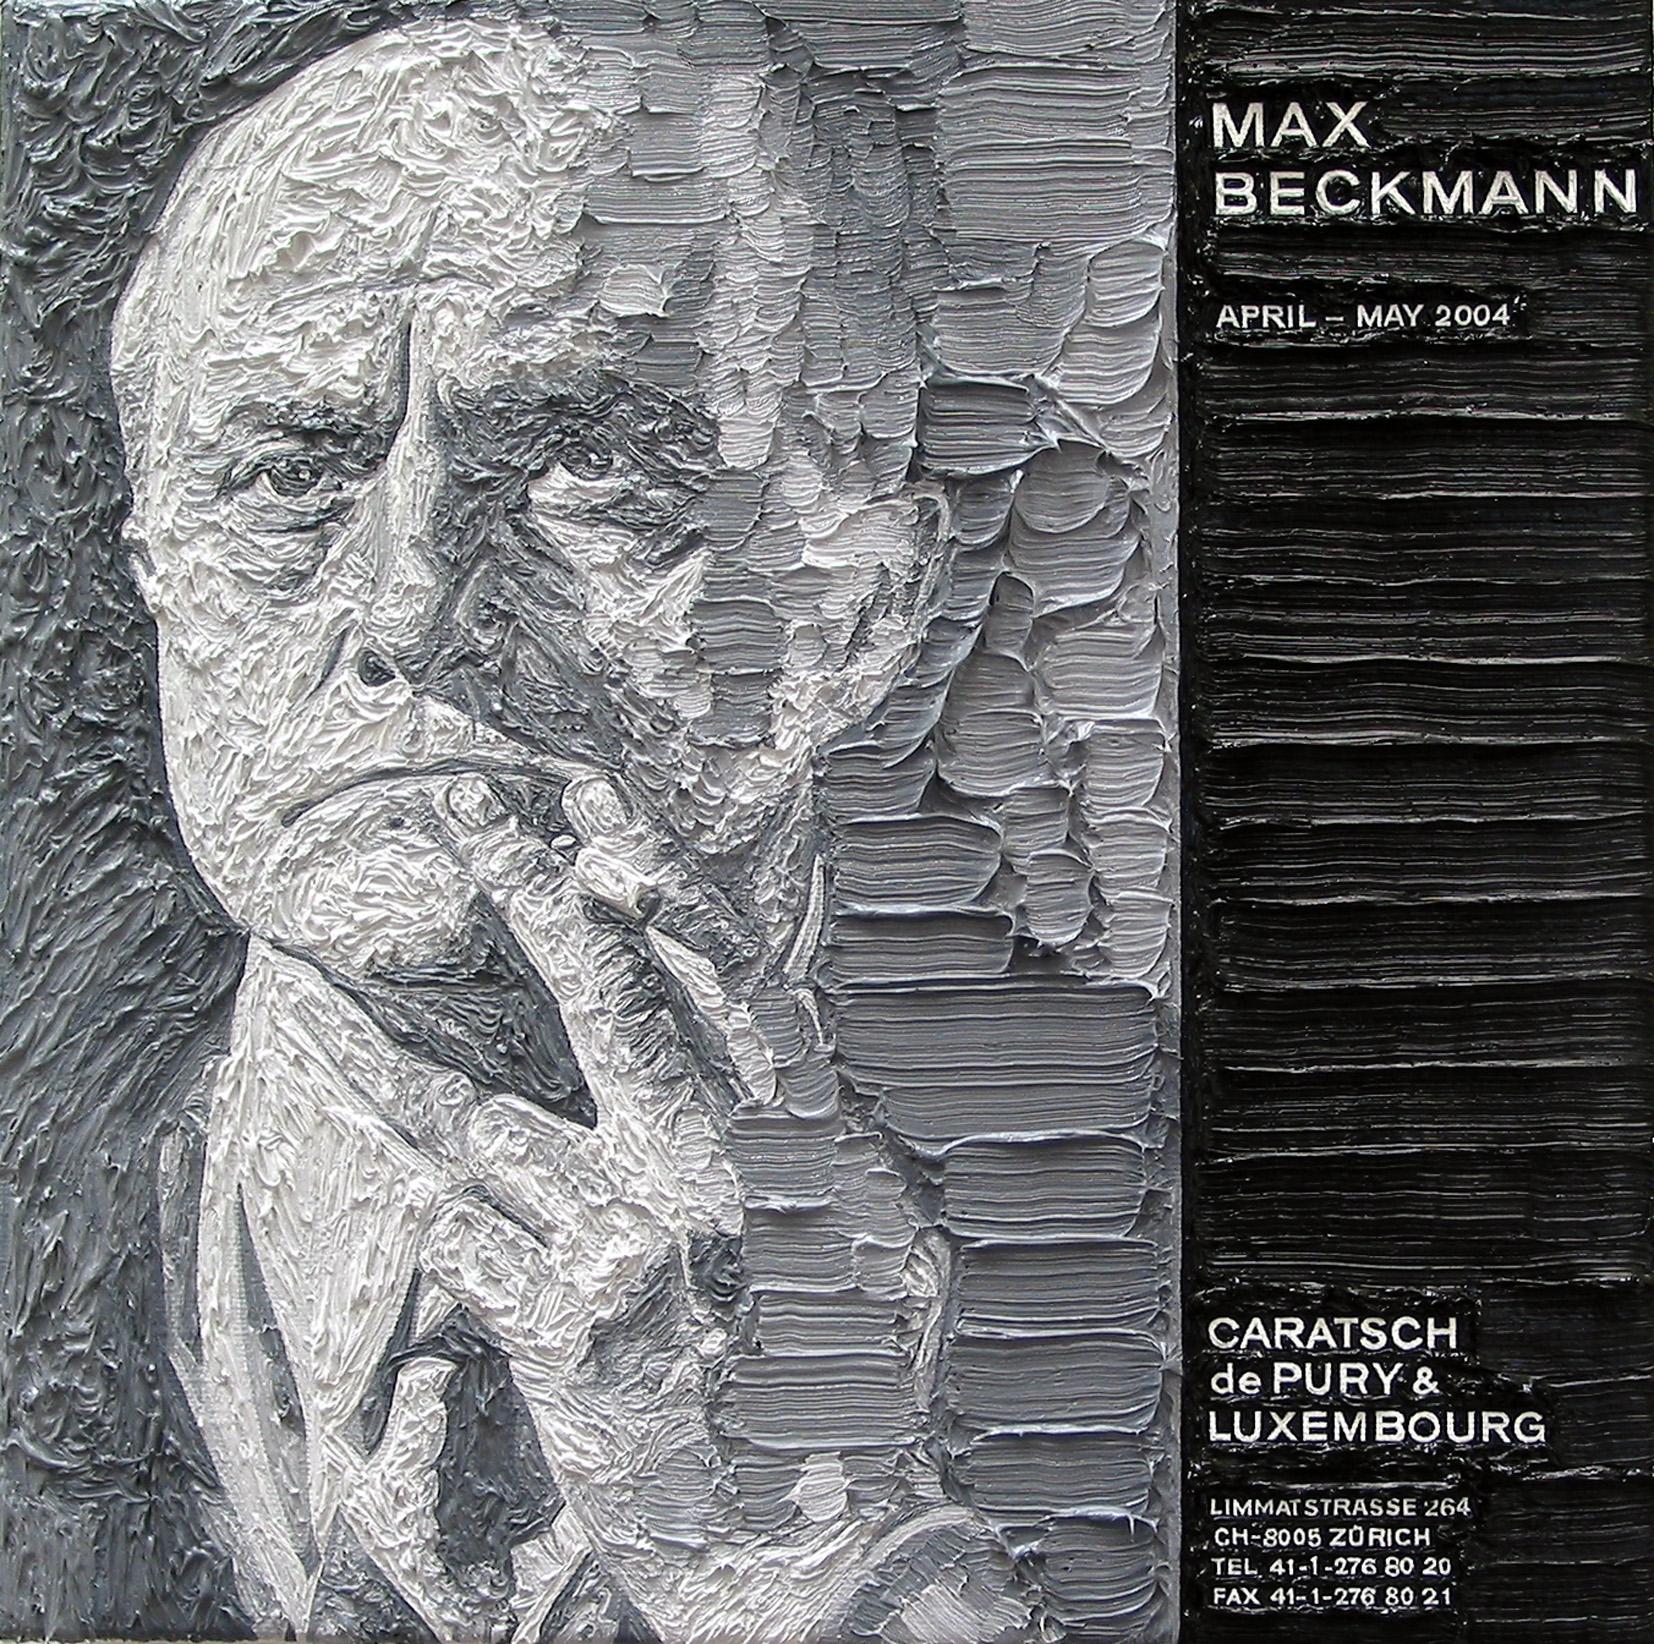 Max Beckmann at Caratsch dePury & Luxembourg